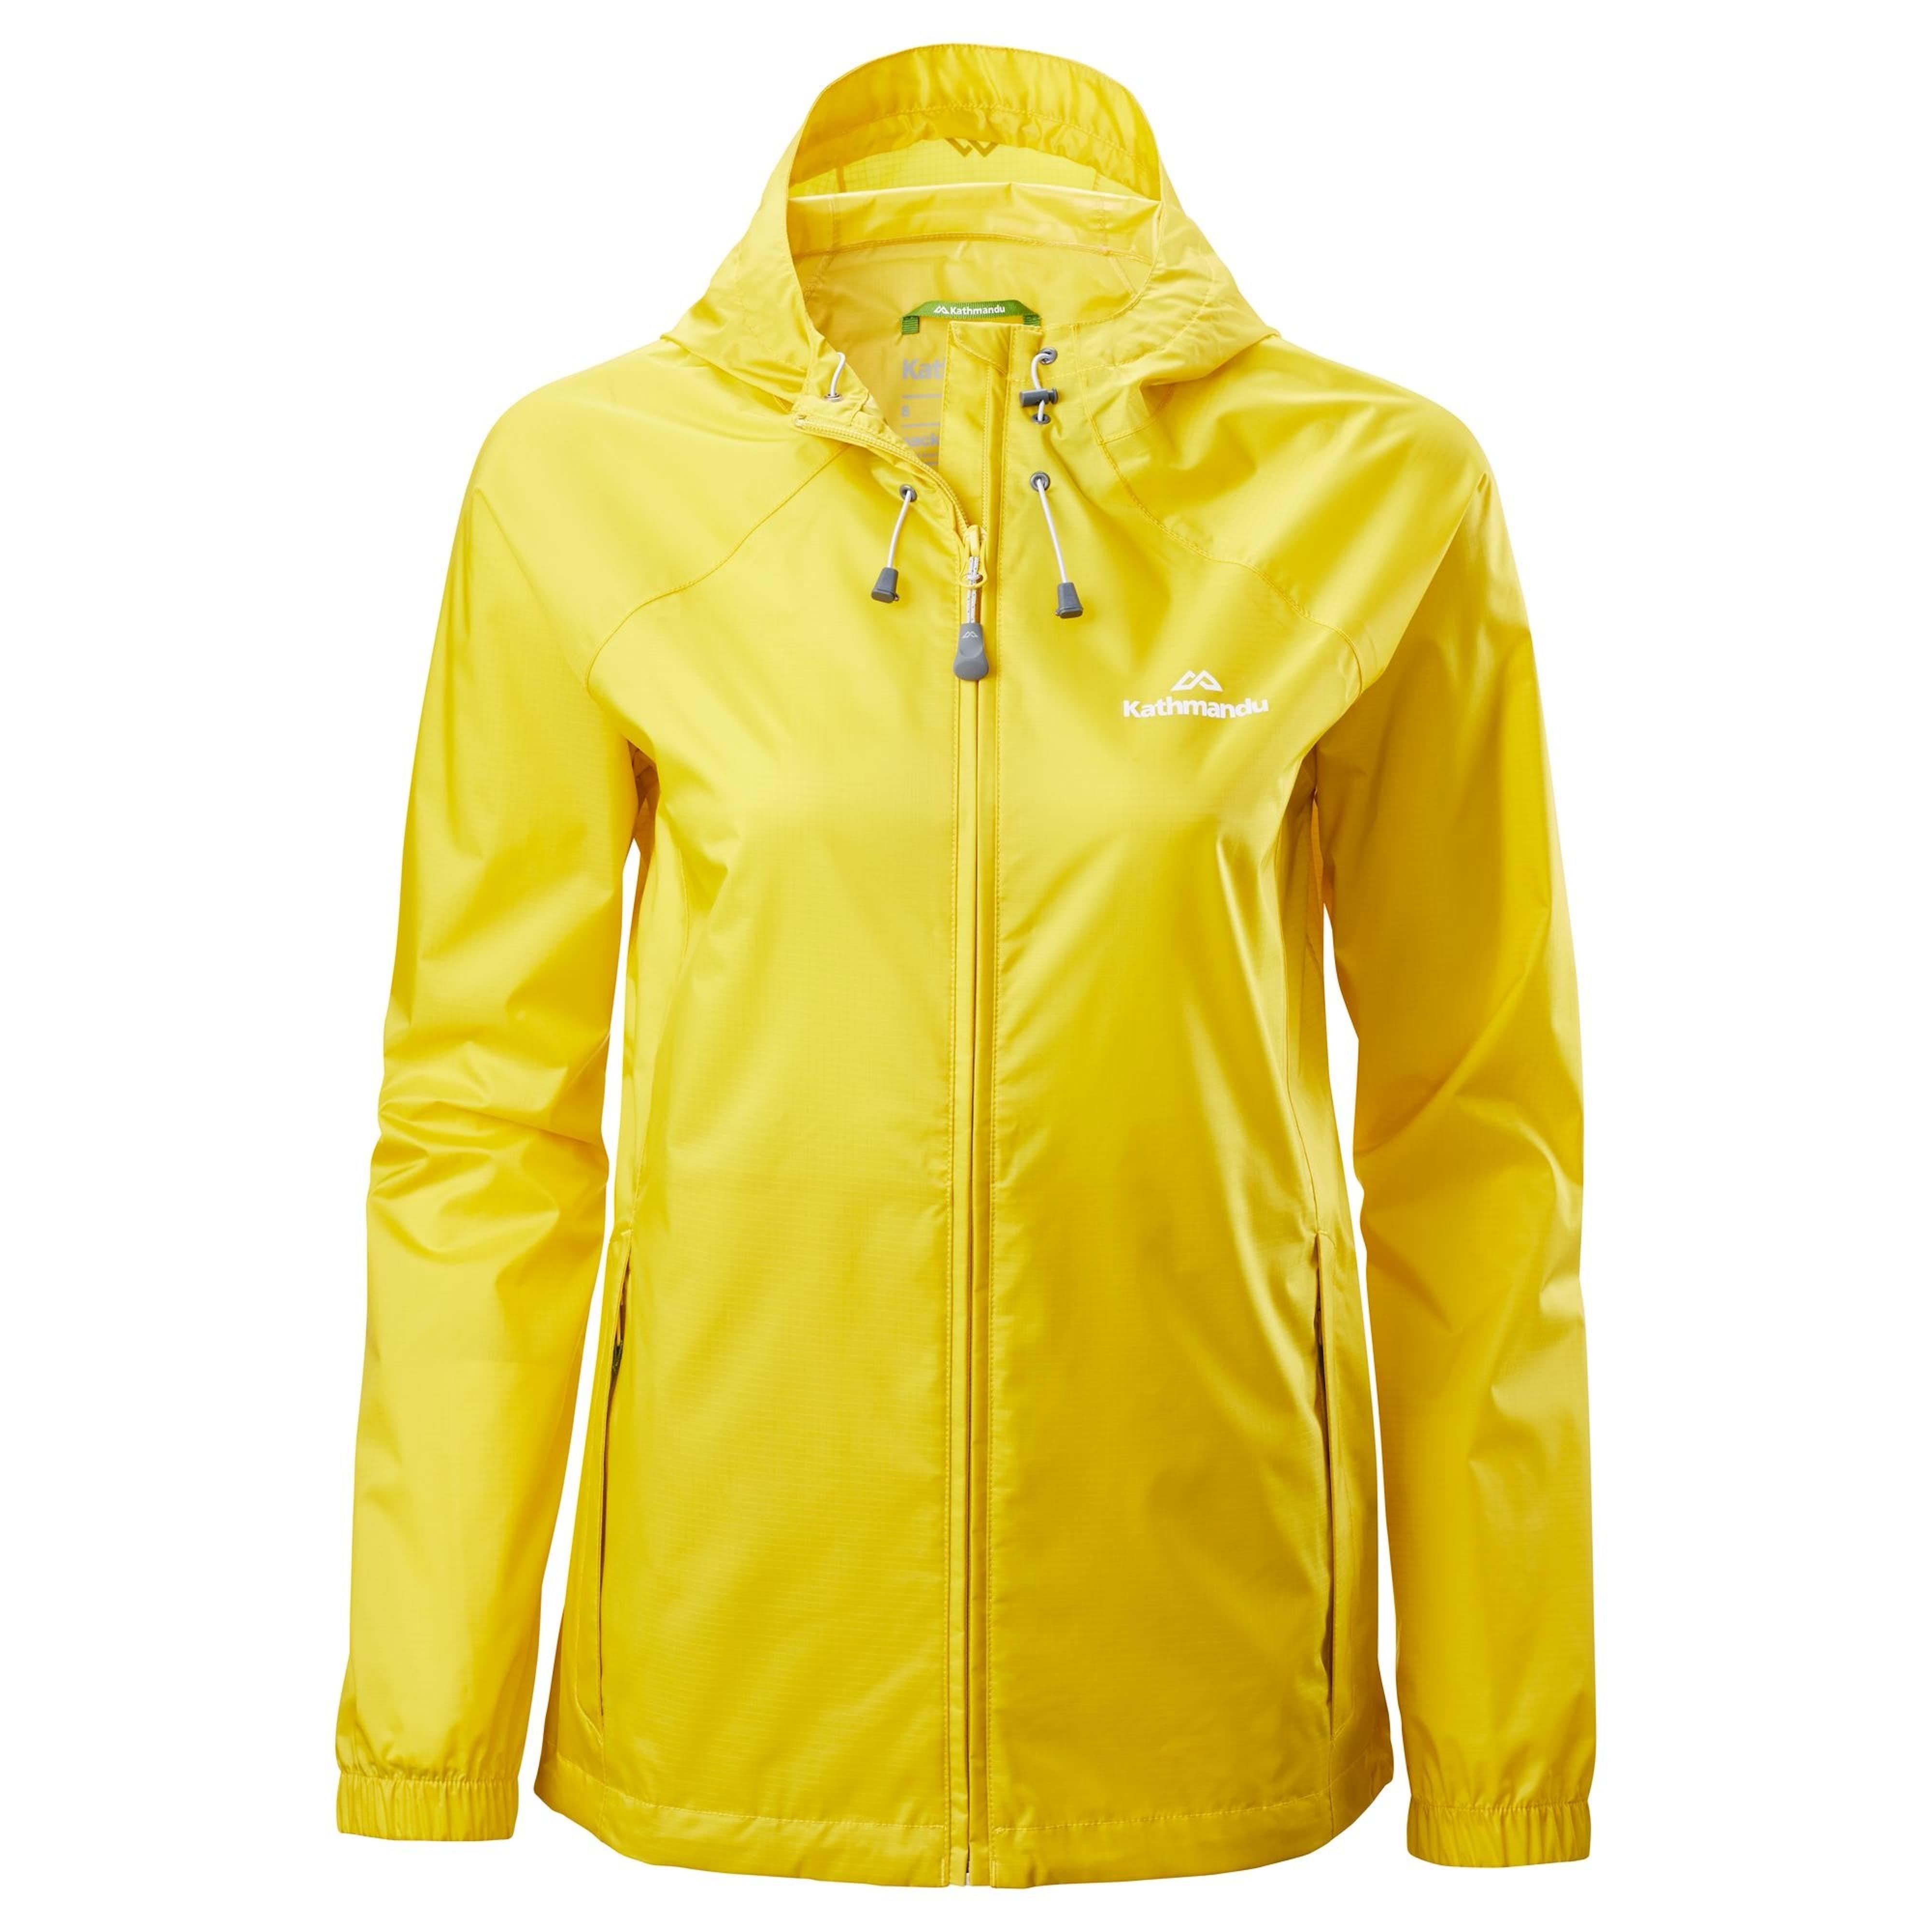 4a8c4fca9 Pocket-it Women's Rain Jacket v3 - Salsa